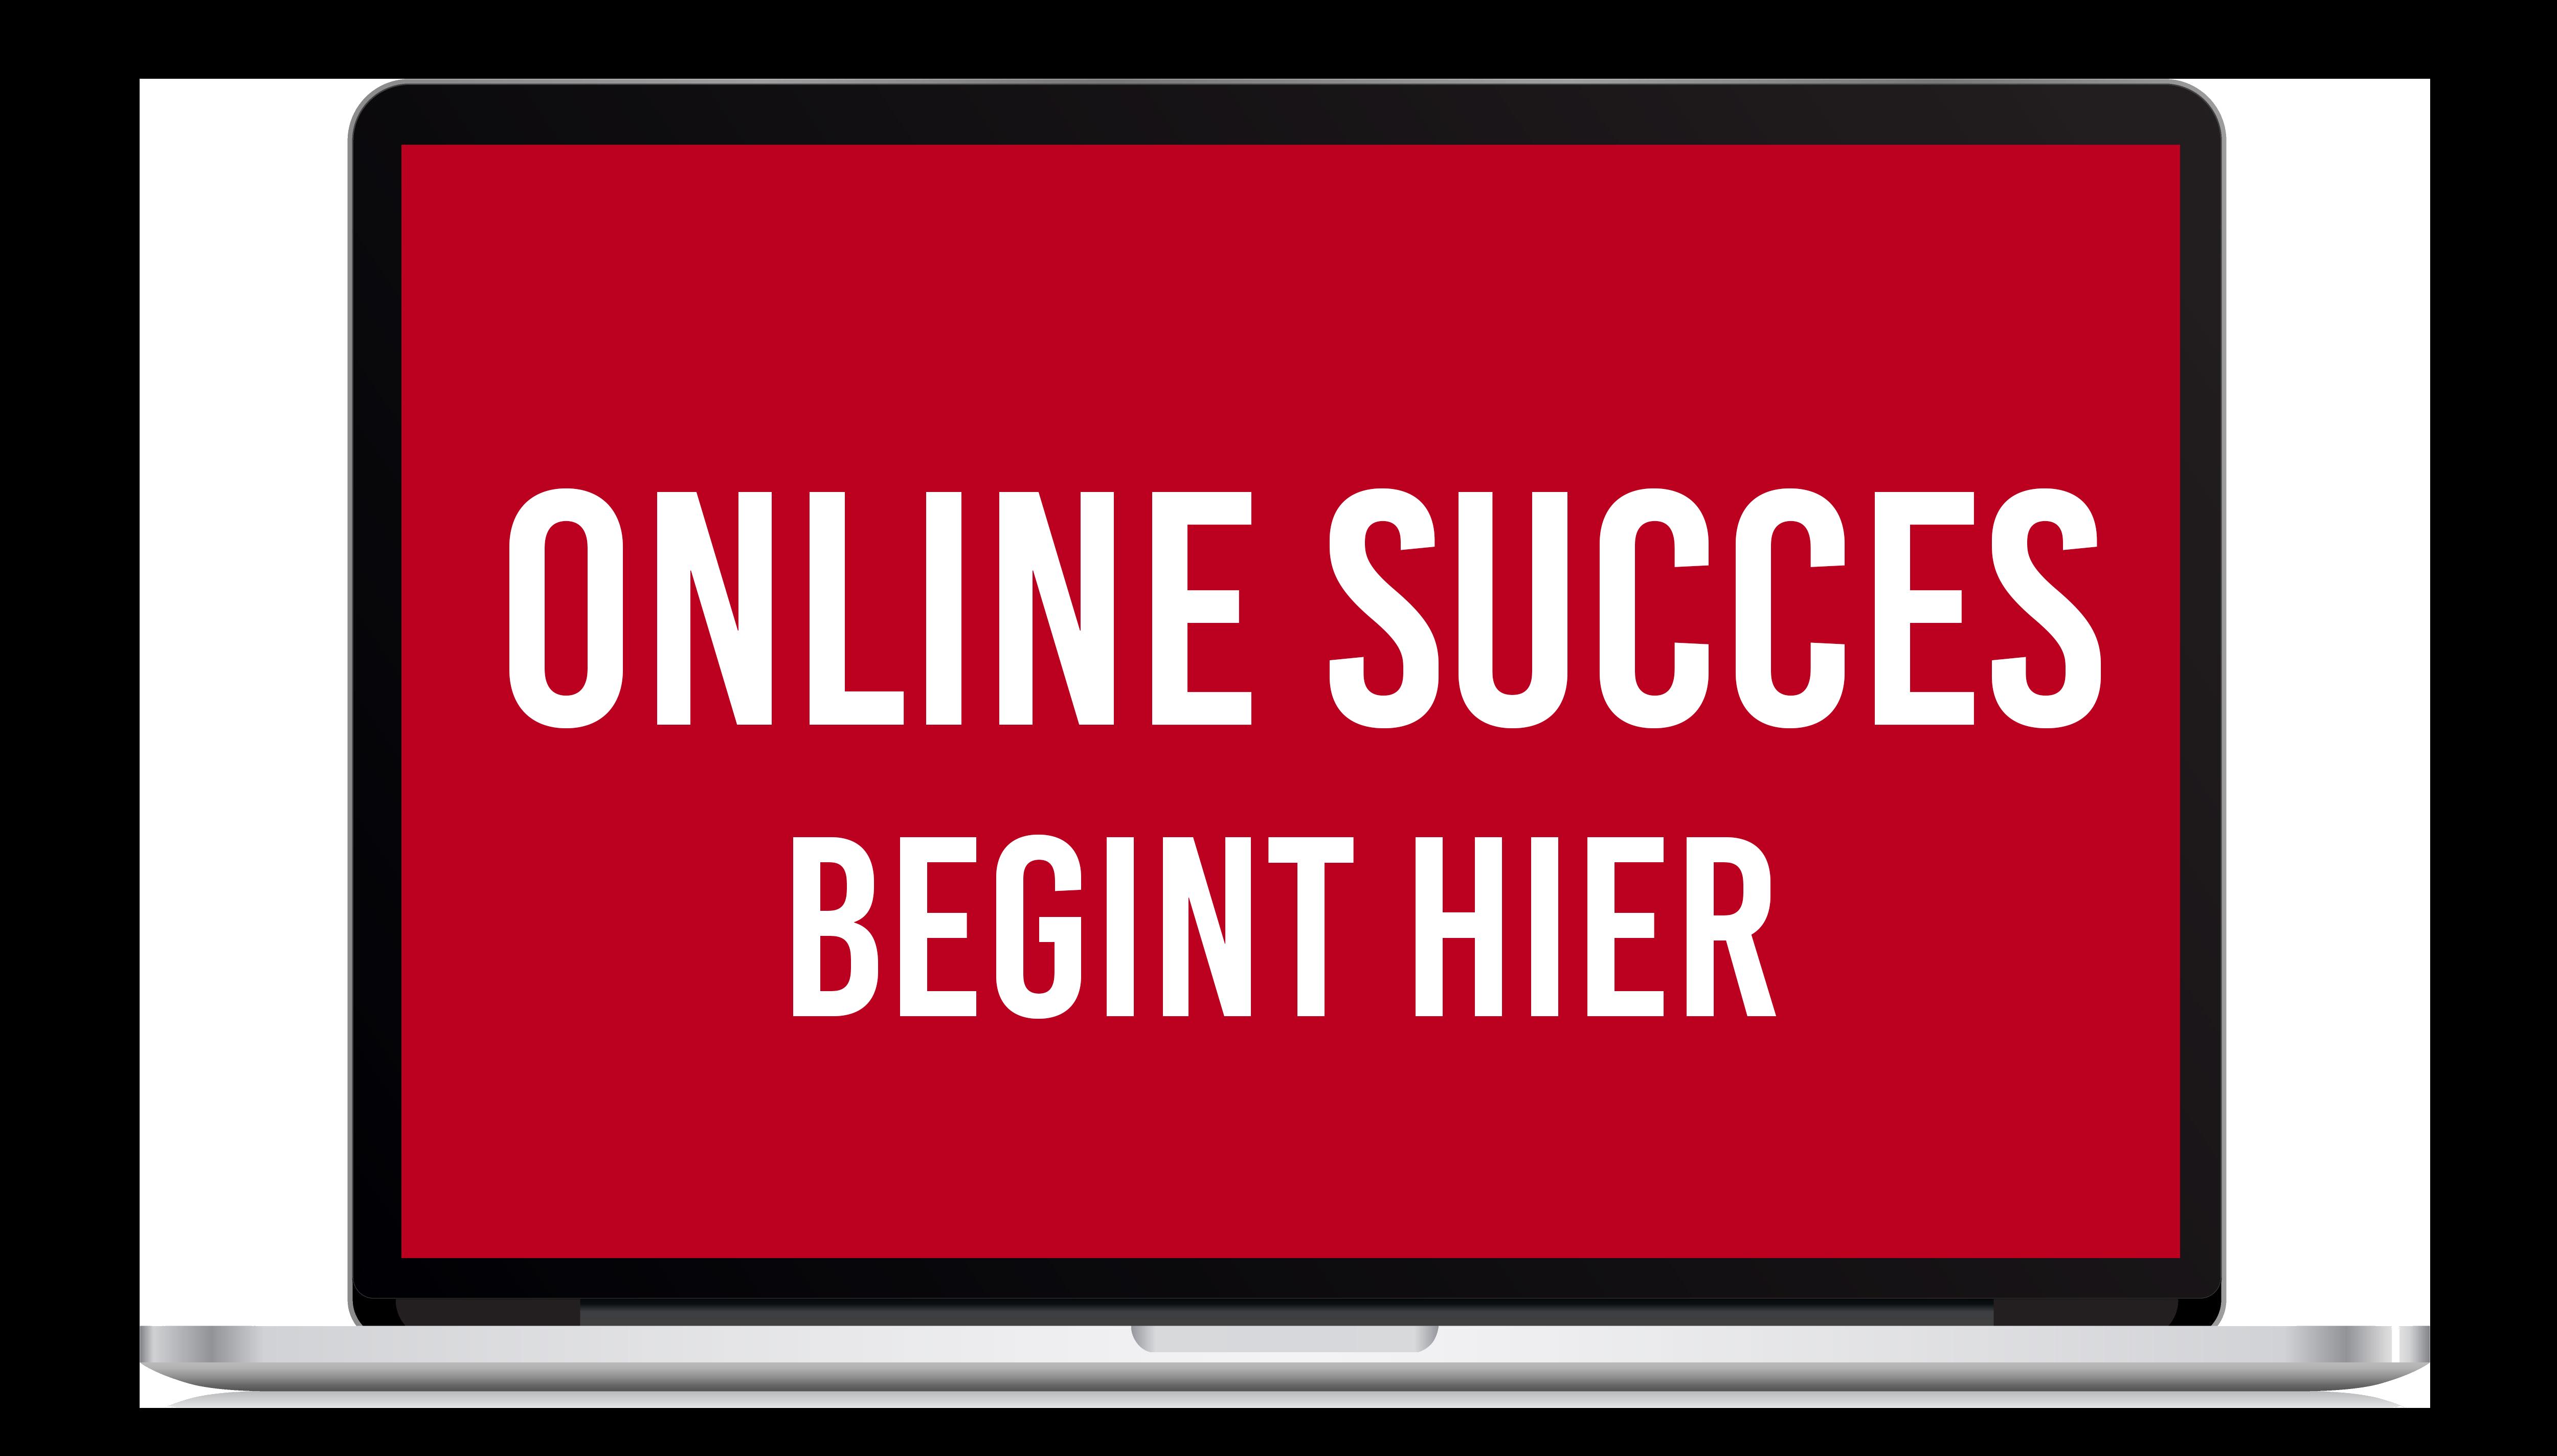 Online Succes begint hier